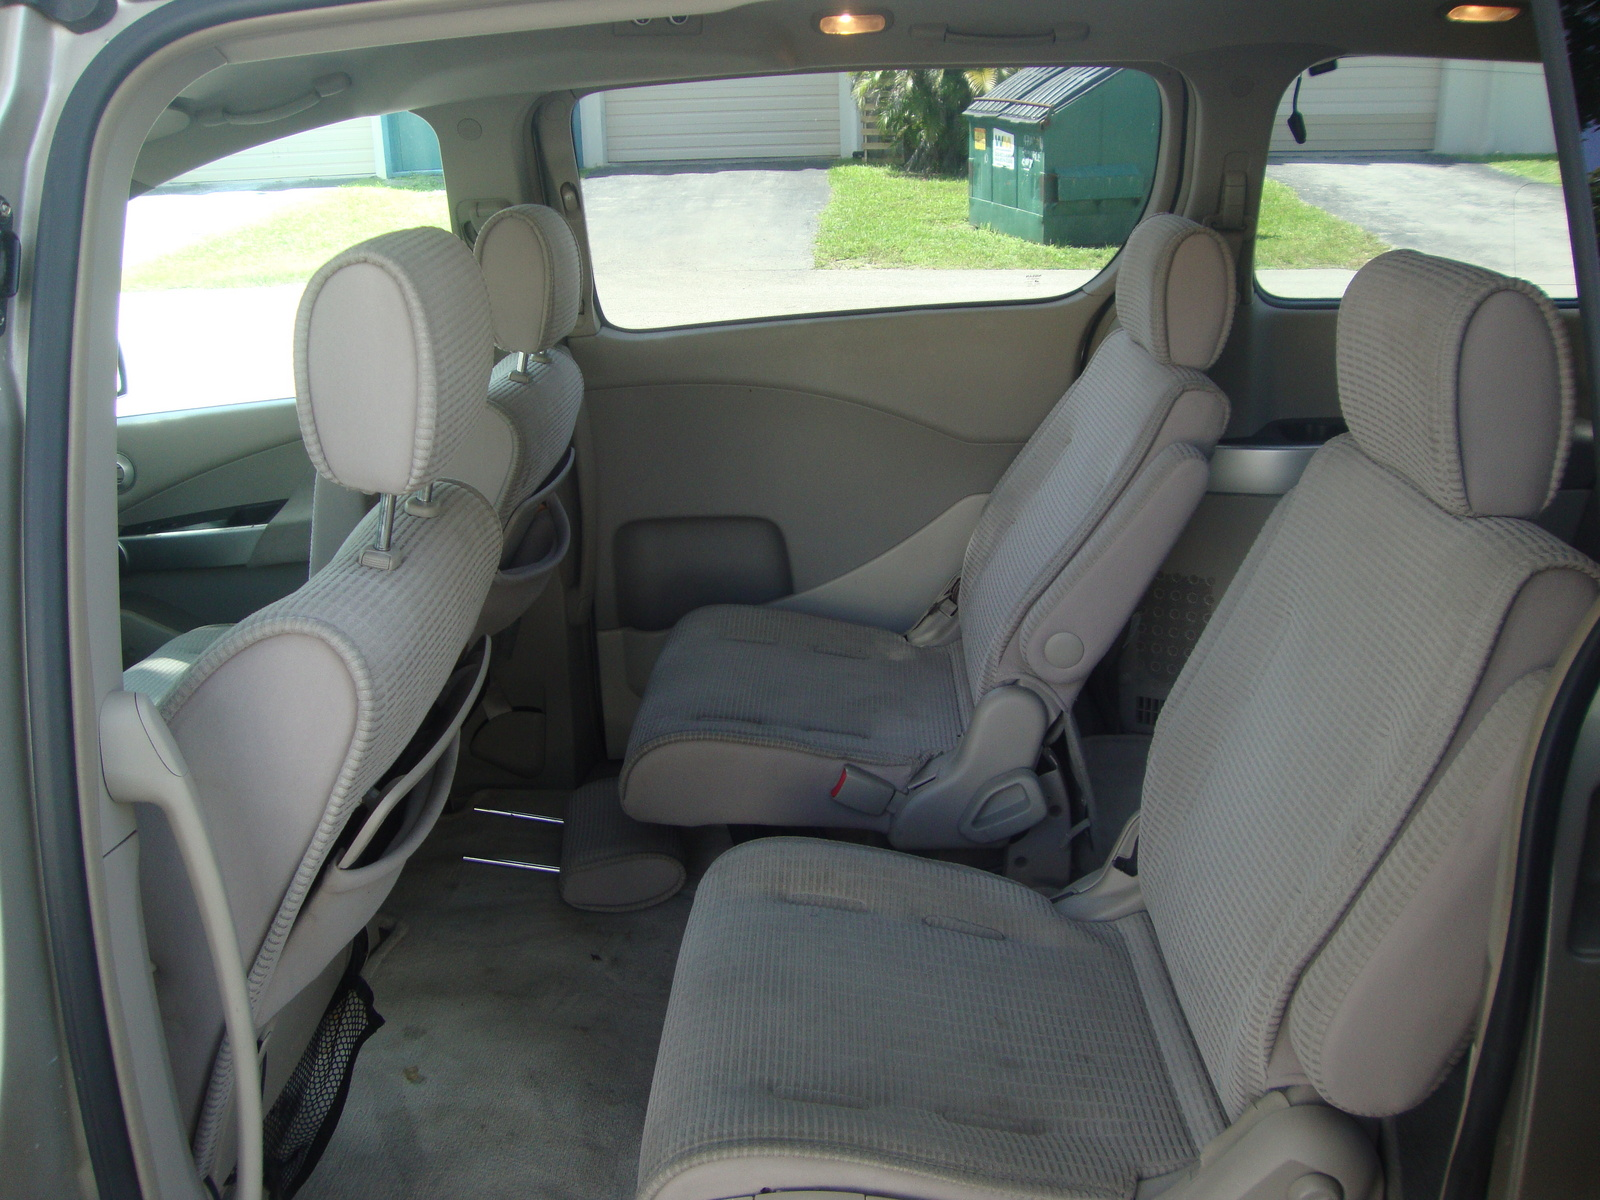 2004 Nissan Quest Pictures Cargurus